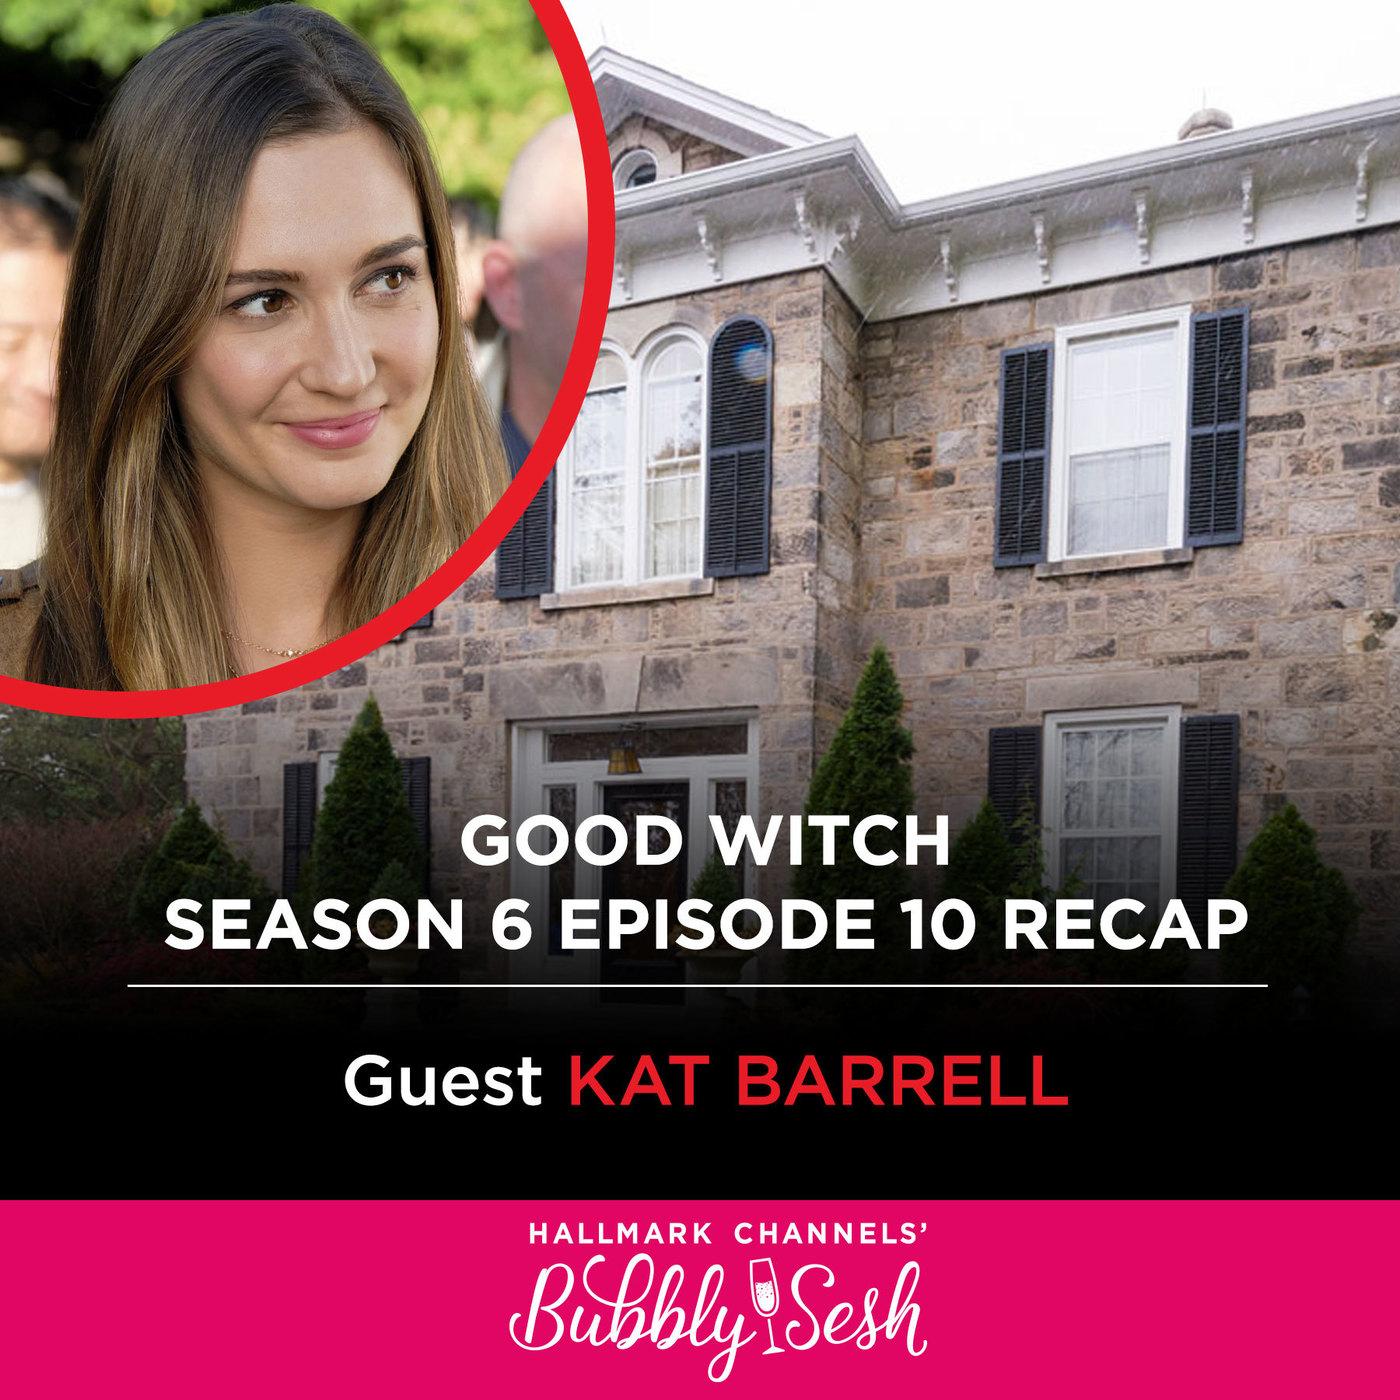 Good Witch Season 6, Episode 10 Recap with Guest Kat Barrell